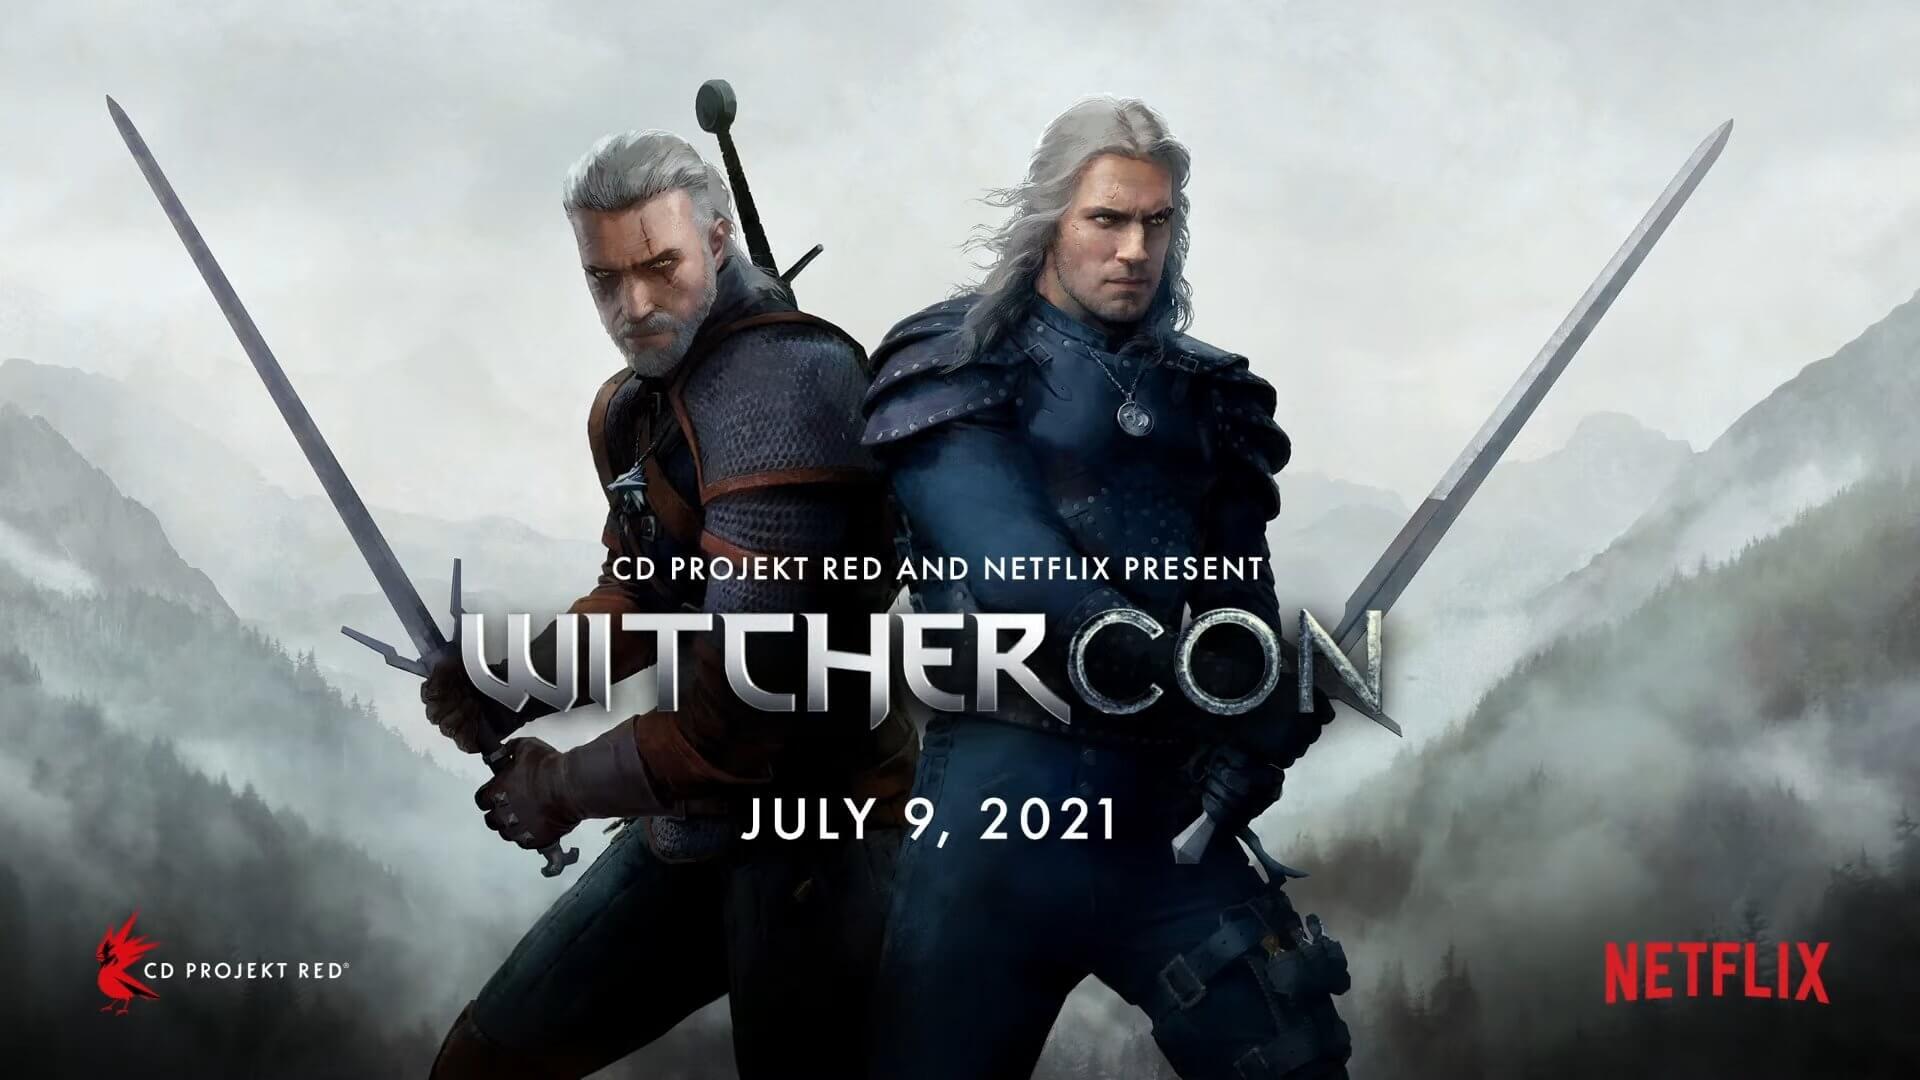 CD Projekt RED y Netflix anuncian la Witchercon, un evento de The Witcher para este 9 de julio